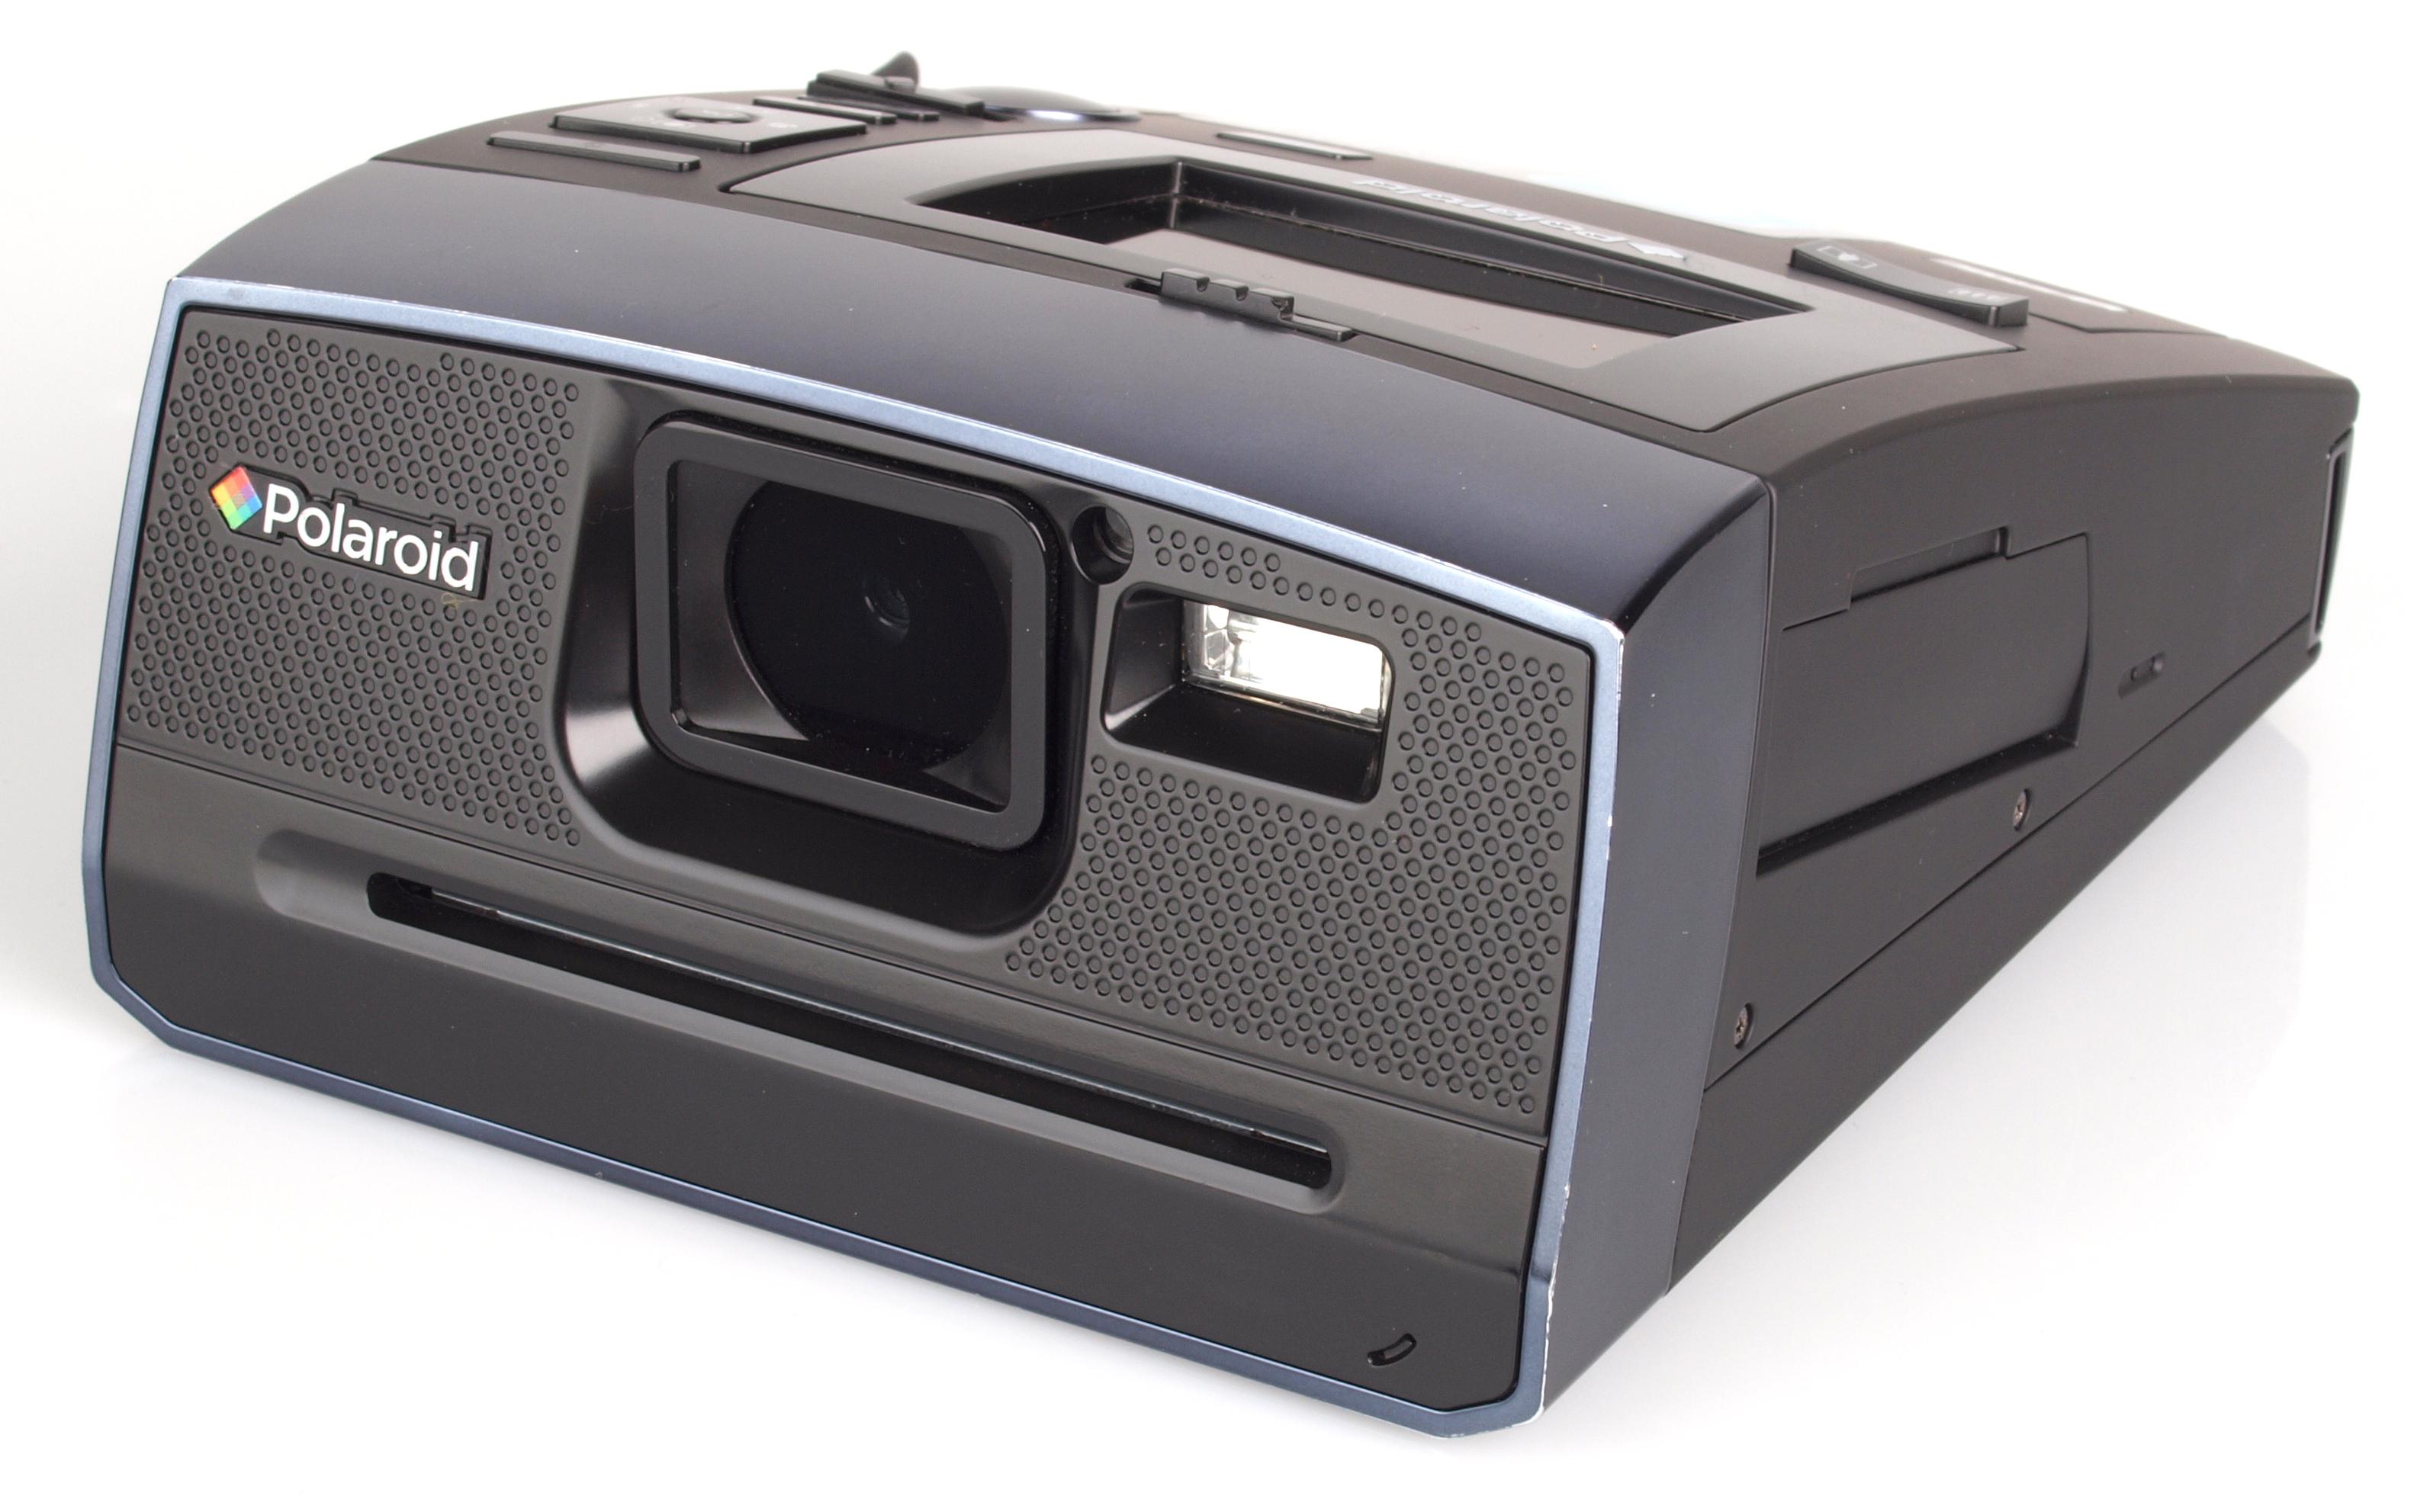 polaroid z340 digital review rh ephotozine com polaroid z340 mode d'emploi Polaroid Darkslide